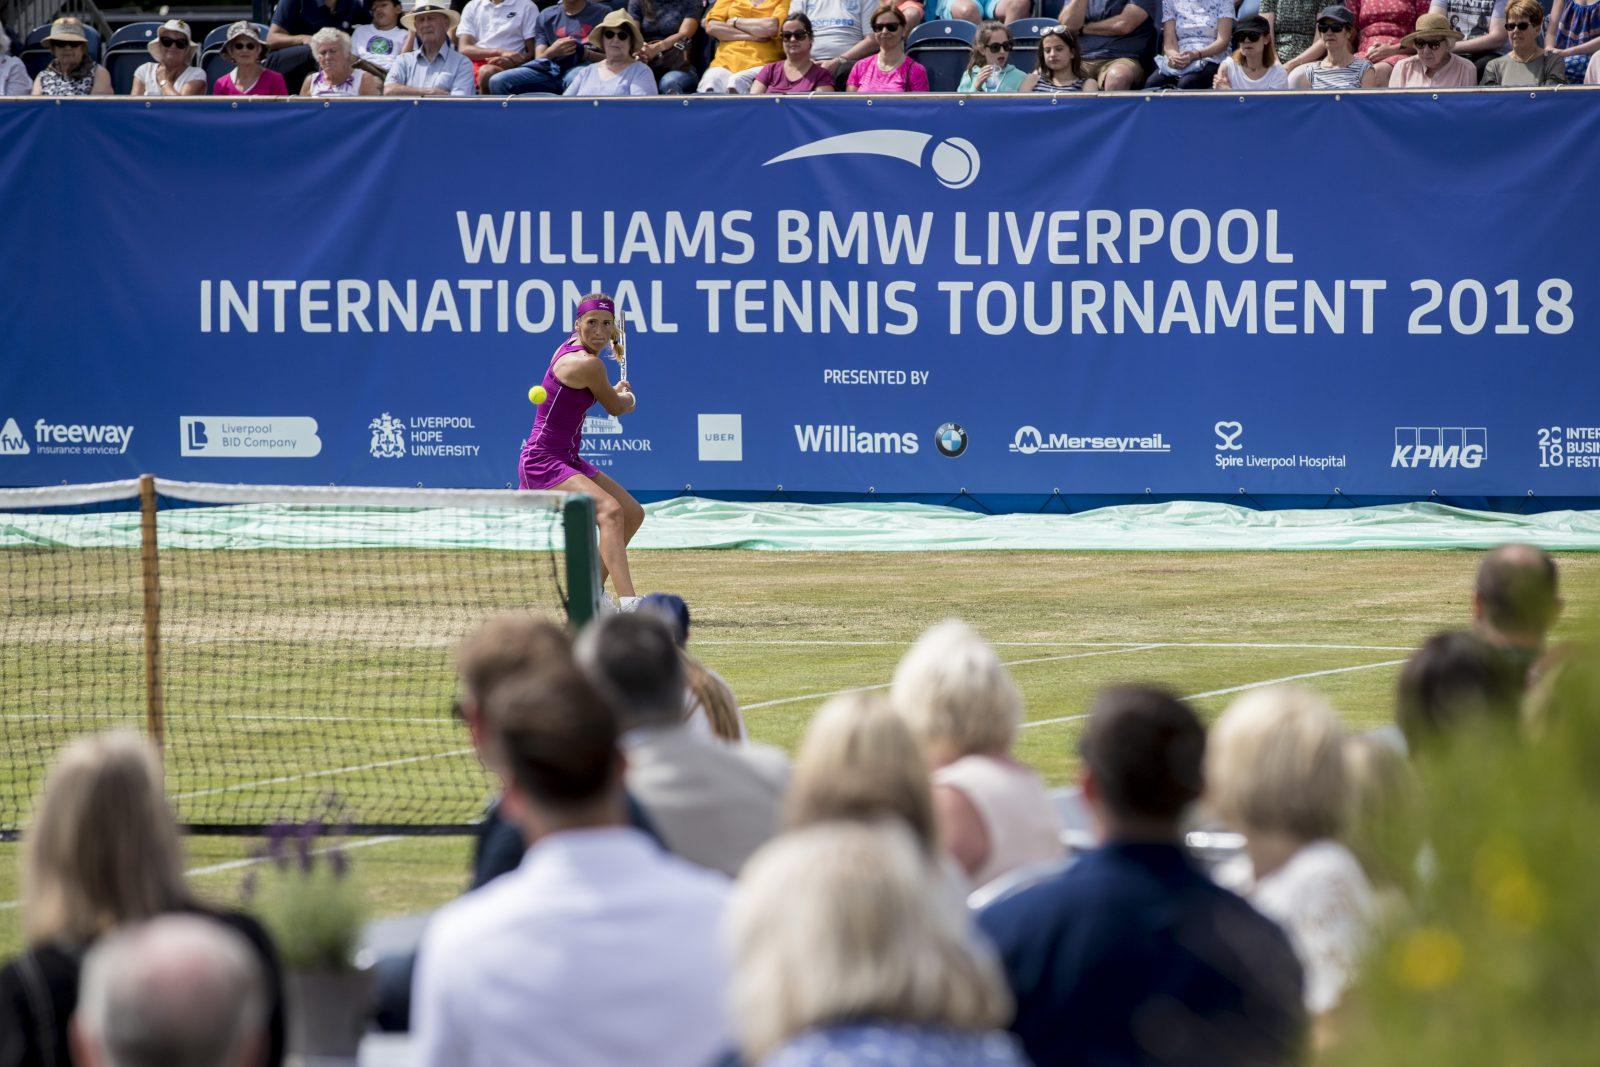 P180623-109-Liverpool_Tennis_D3-1600×1067